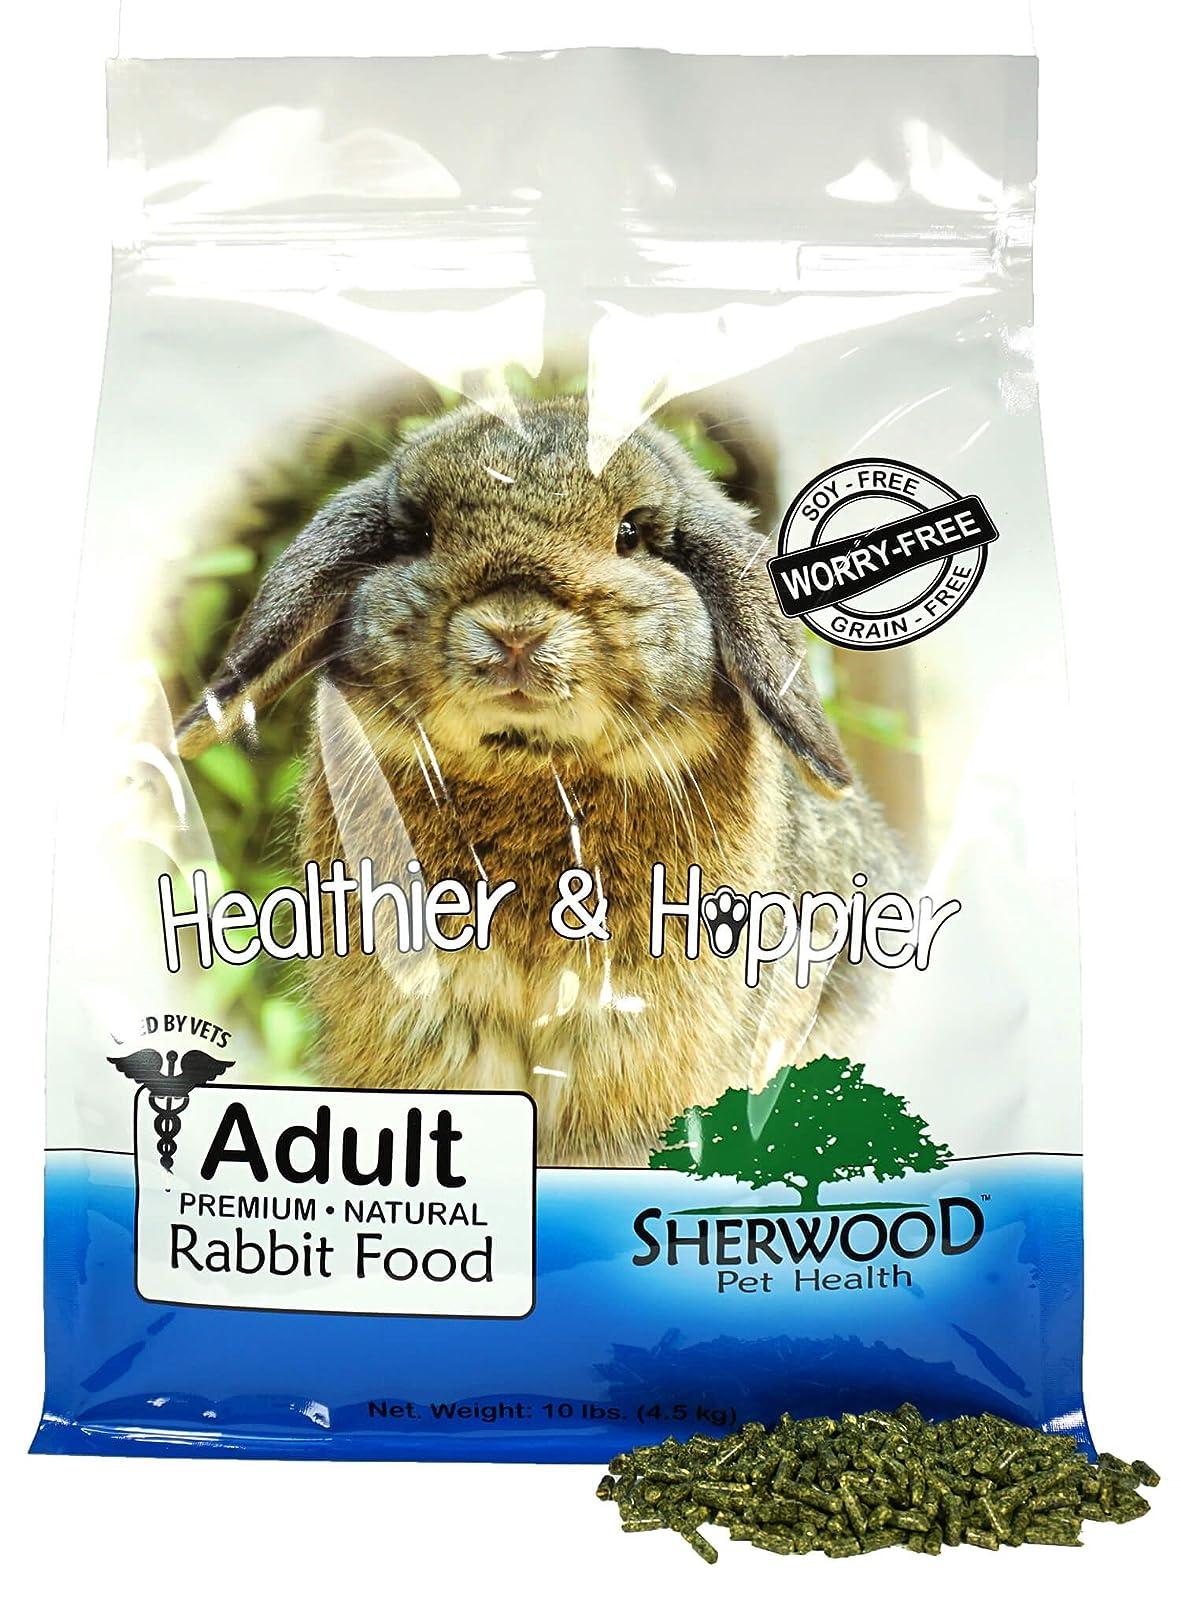 Sherwood Pet Health Rabbit Food Adult 10 - 1